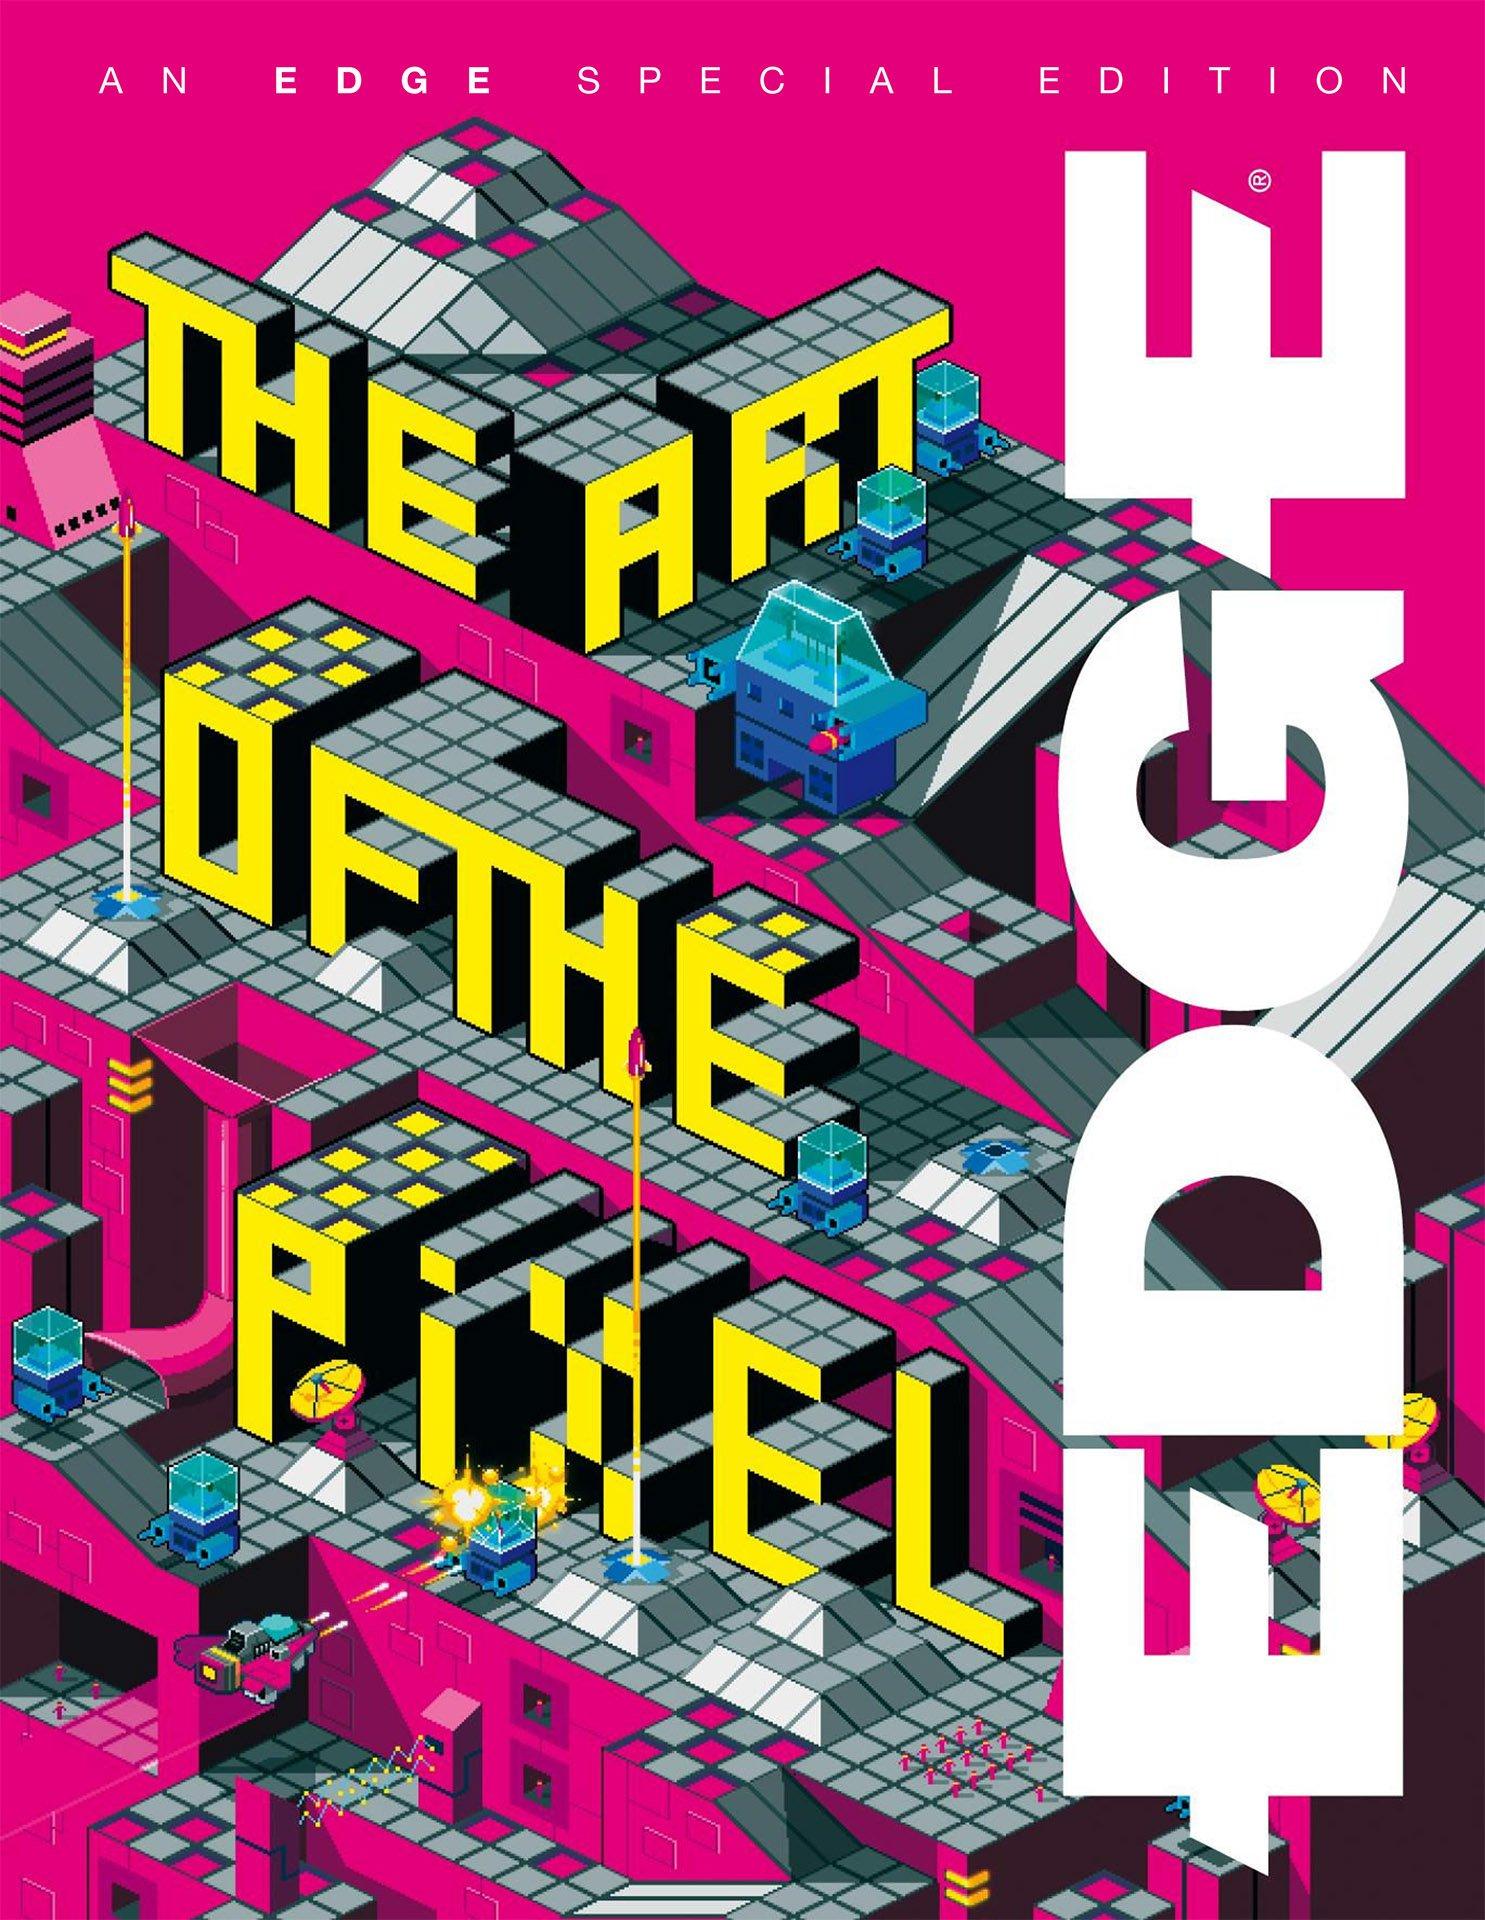 Edge: The Art Of The Pixel (2016)